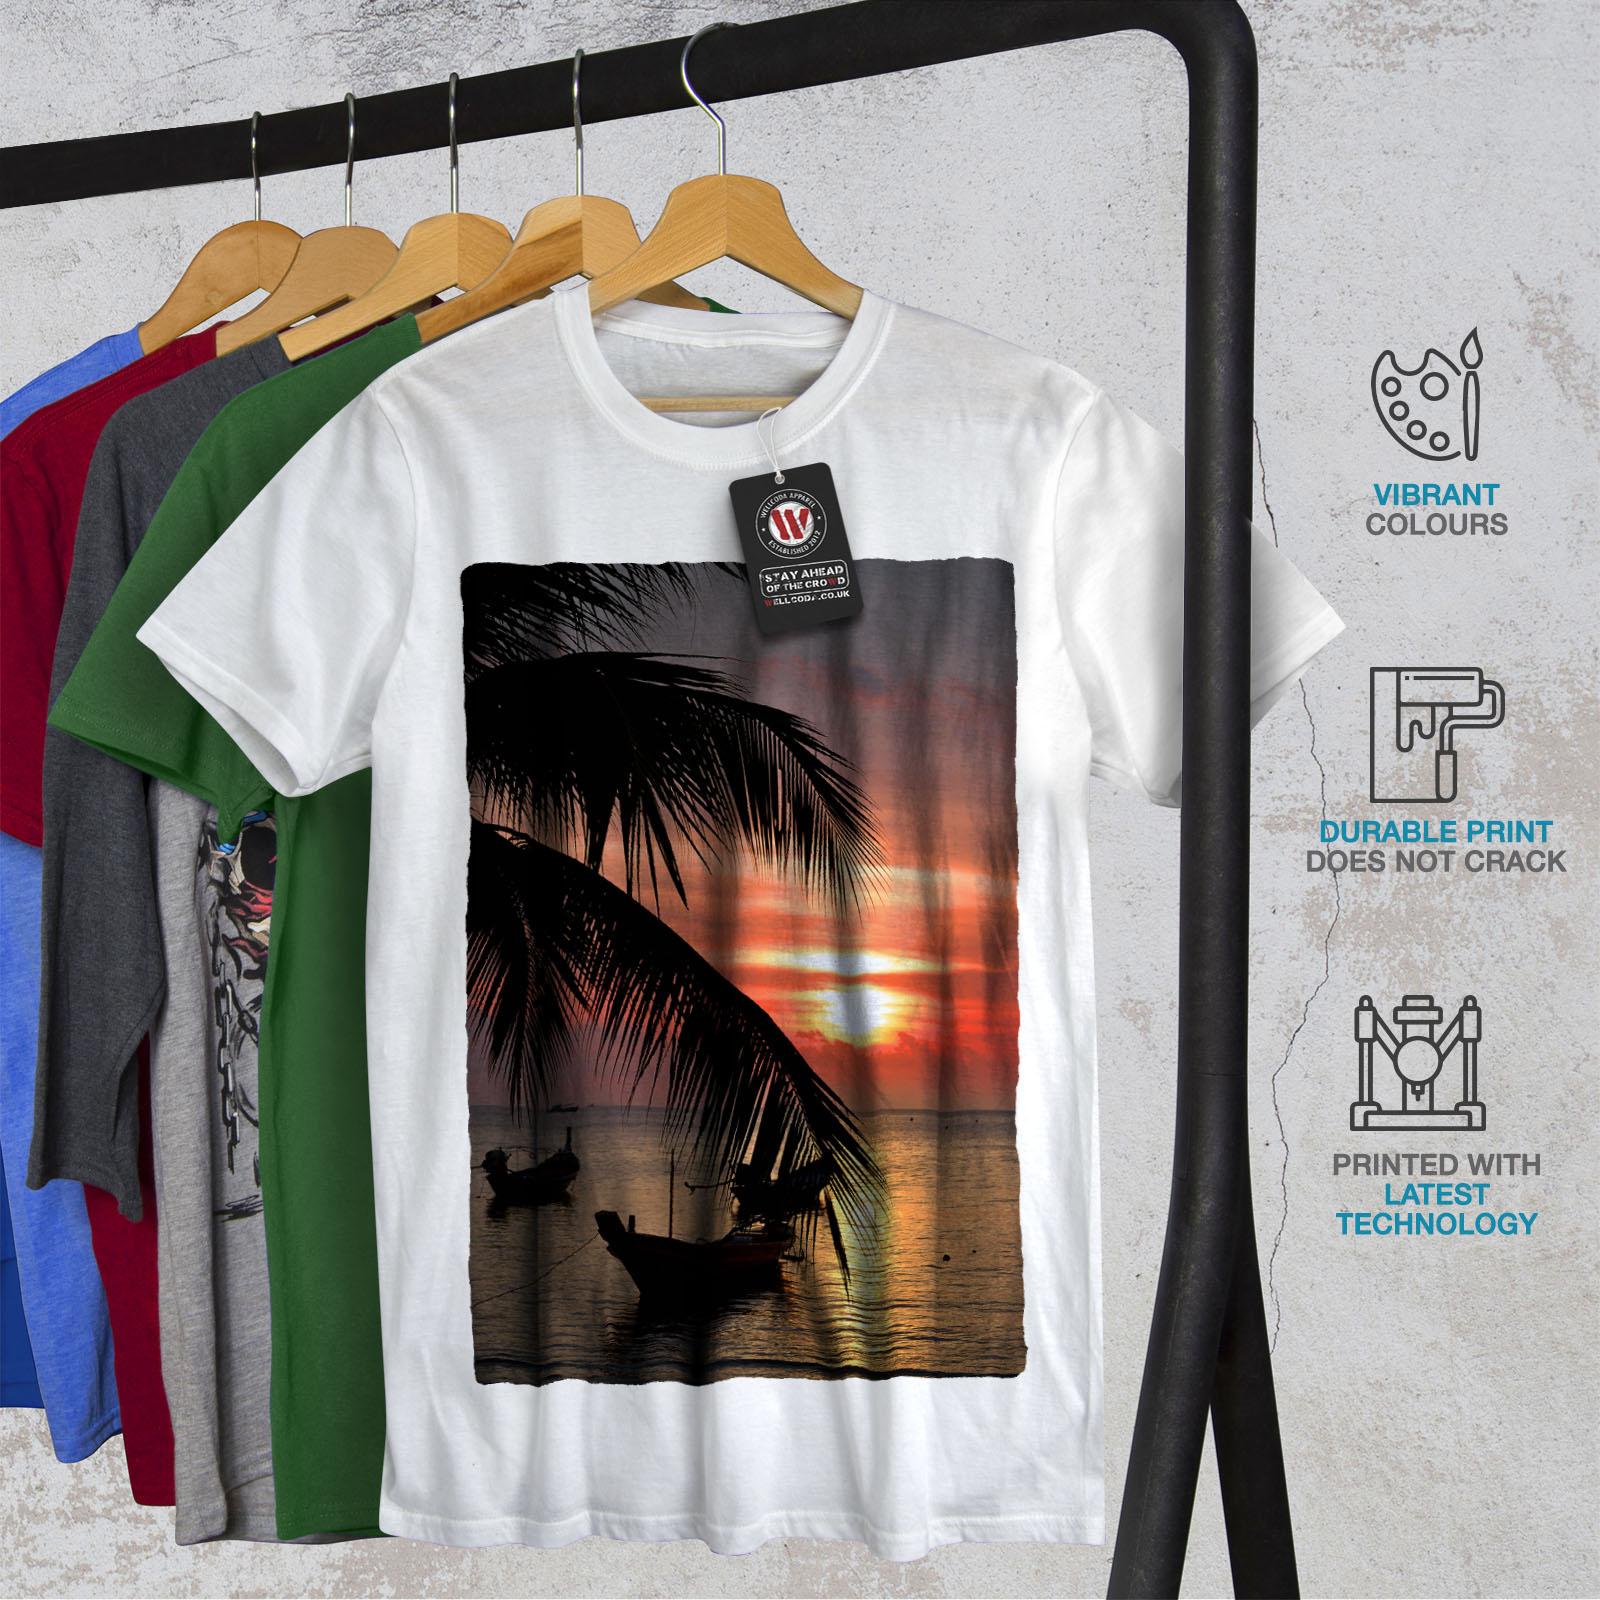 Wellcoda-Sunset-Palm-Tree-Mens-T-shirt-Ocean-Beach-Graphic-Design-Printed-Tee thumbnail 12